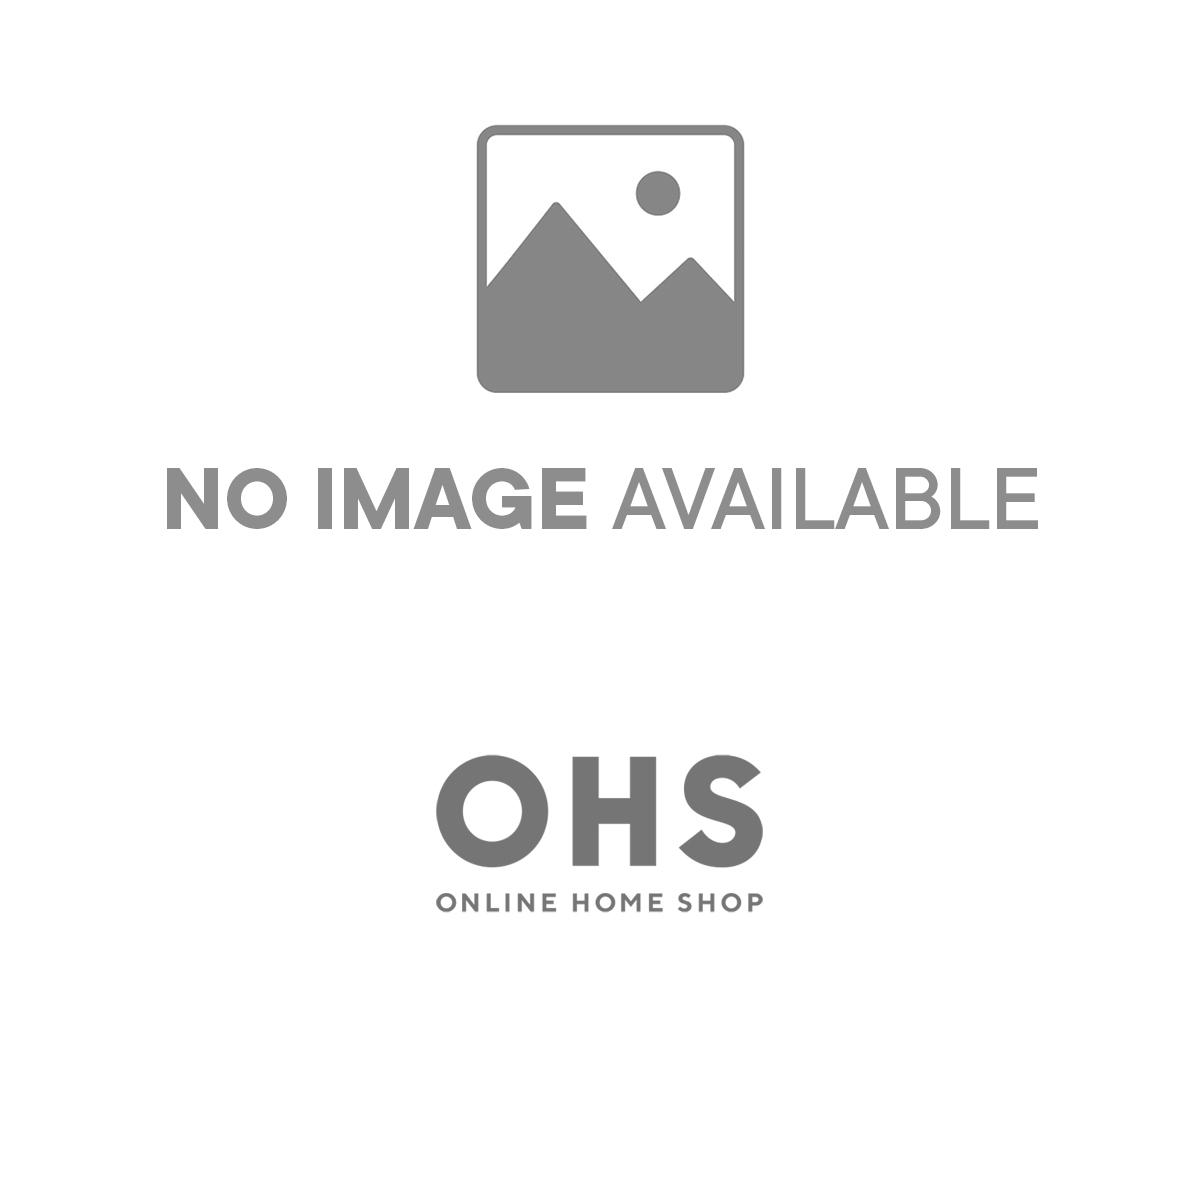 Highams 100% Brushed Cotton Reversible Complete Duvet Cover Set - Charcoal & Grey